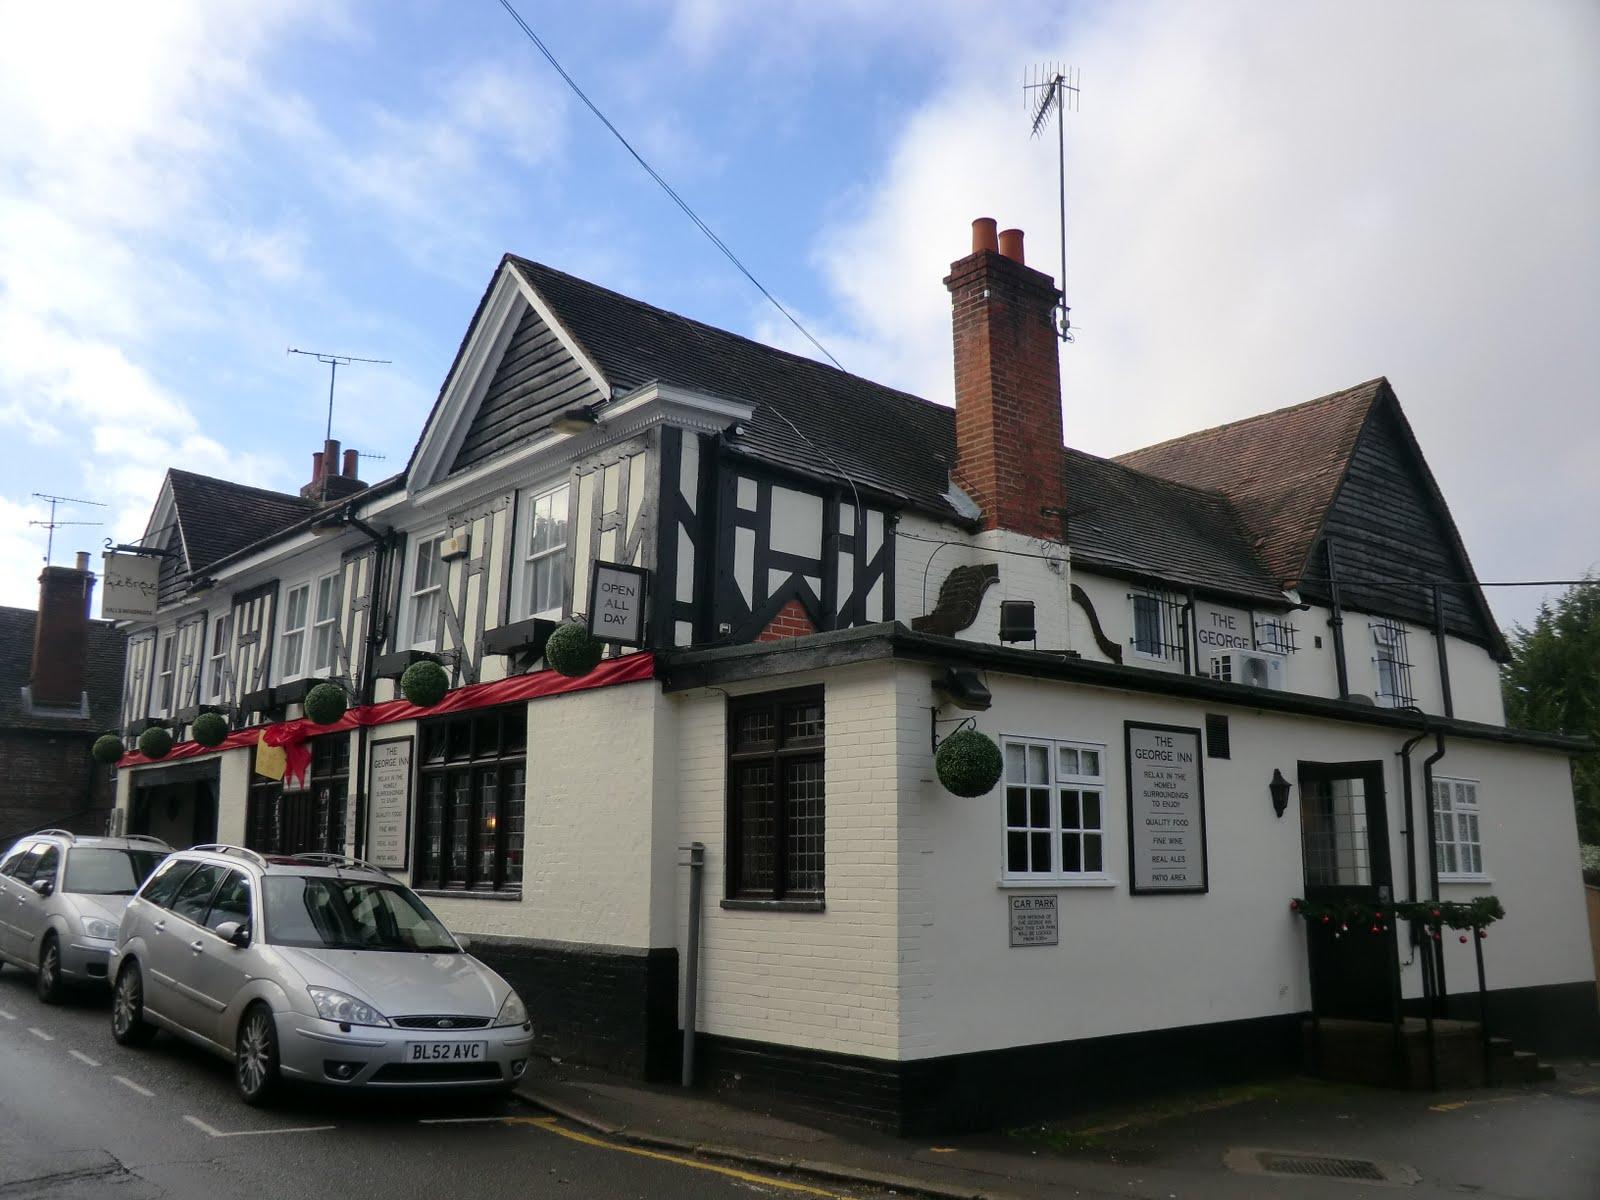 CIMG5136 The George Inn, Old Oxted